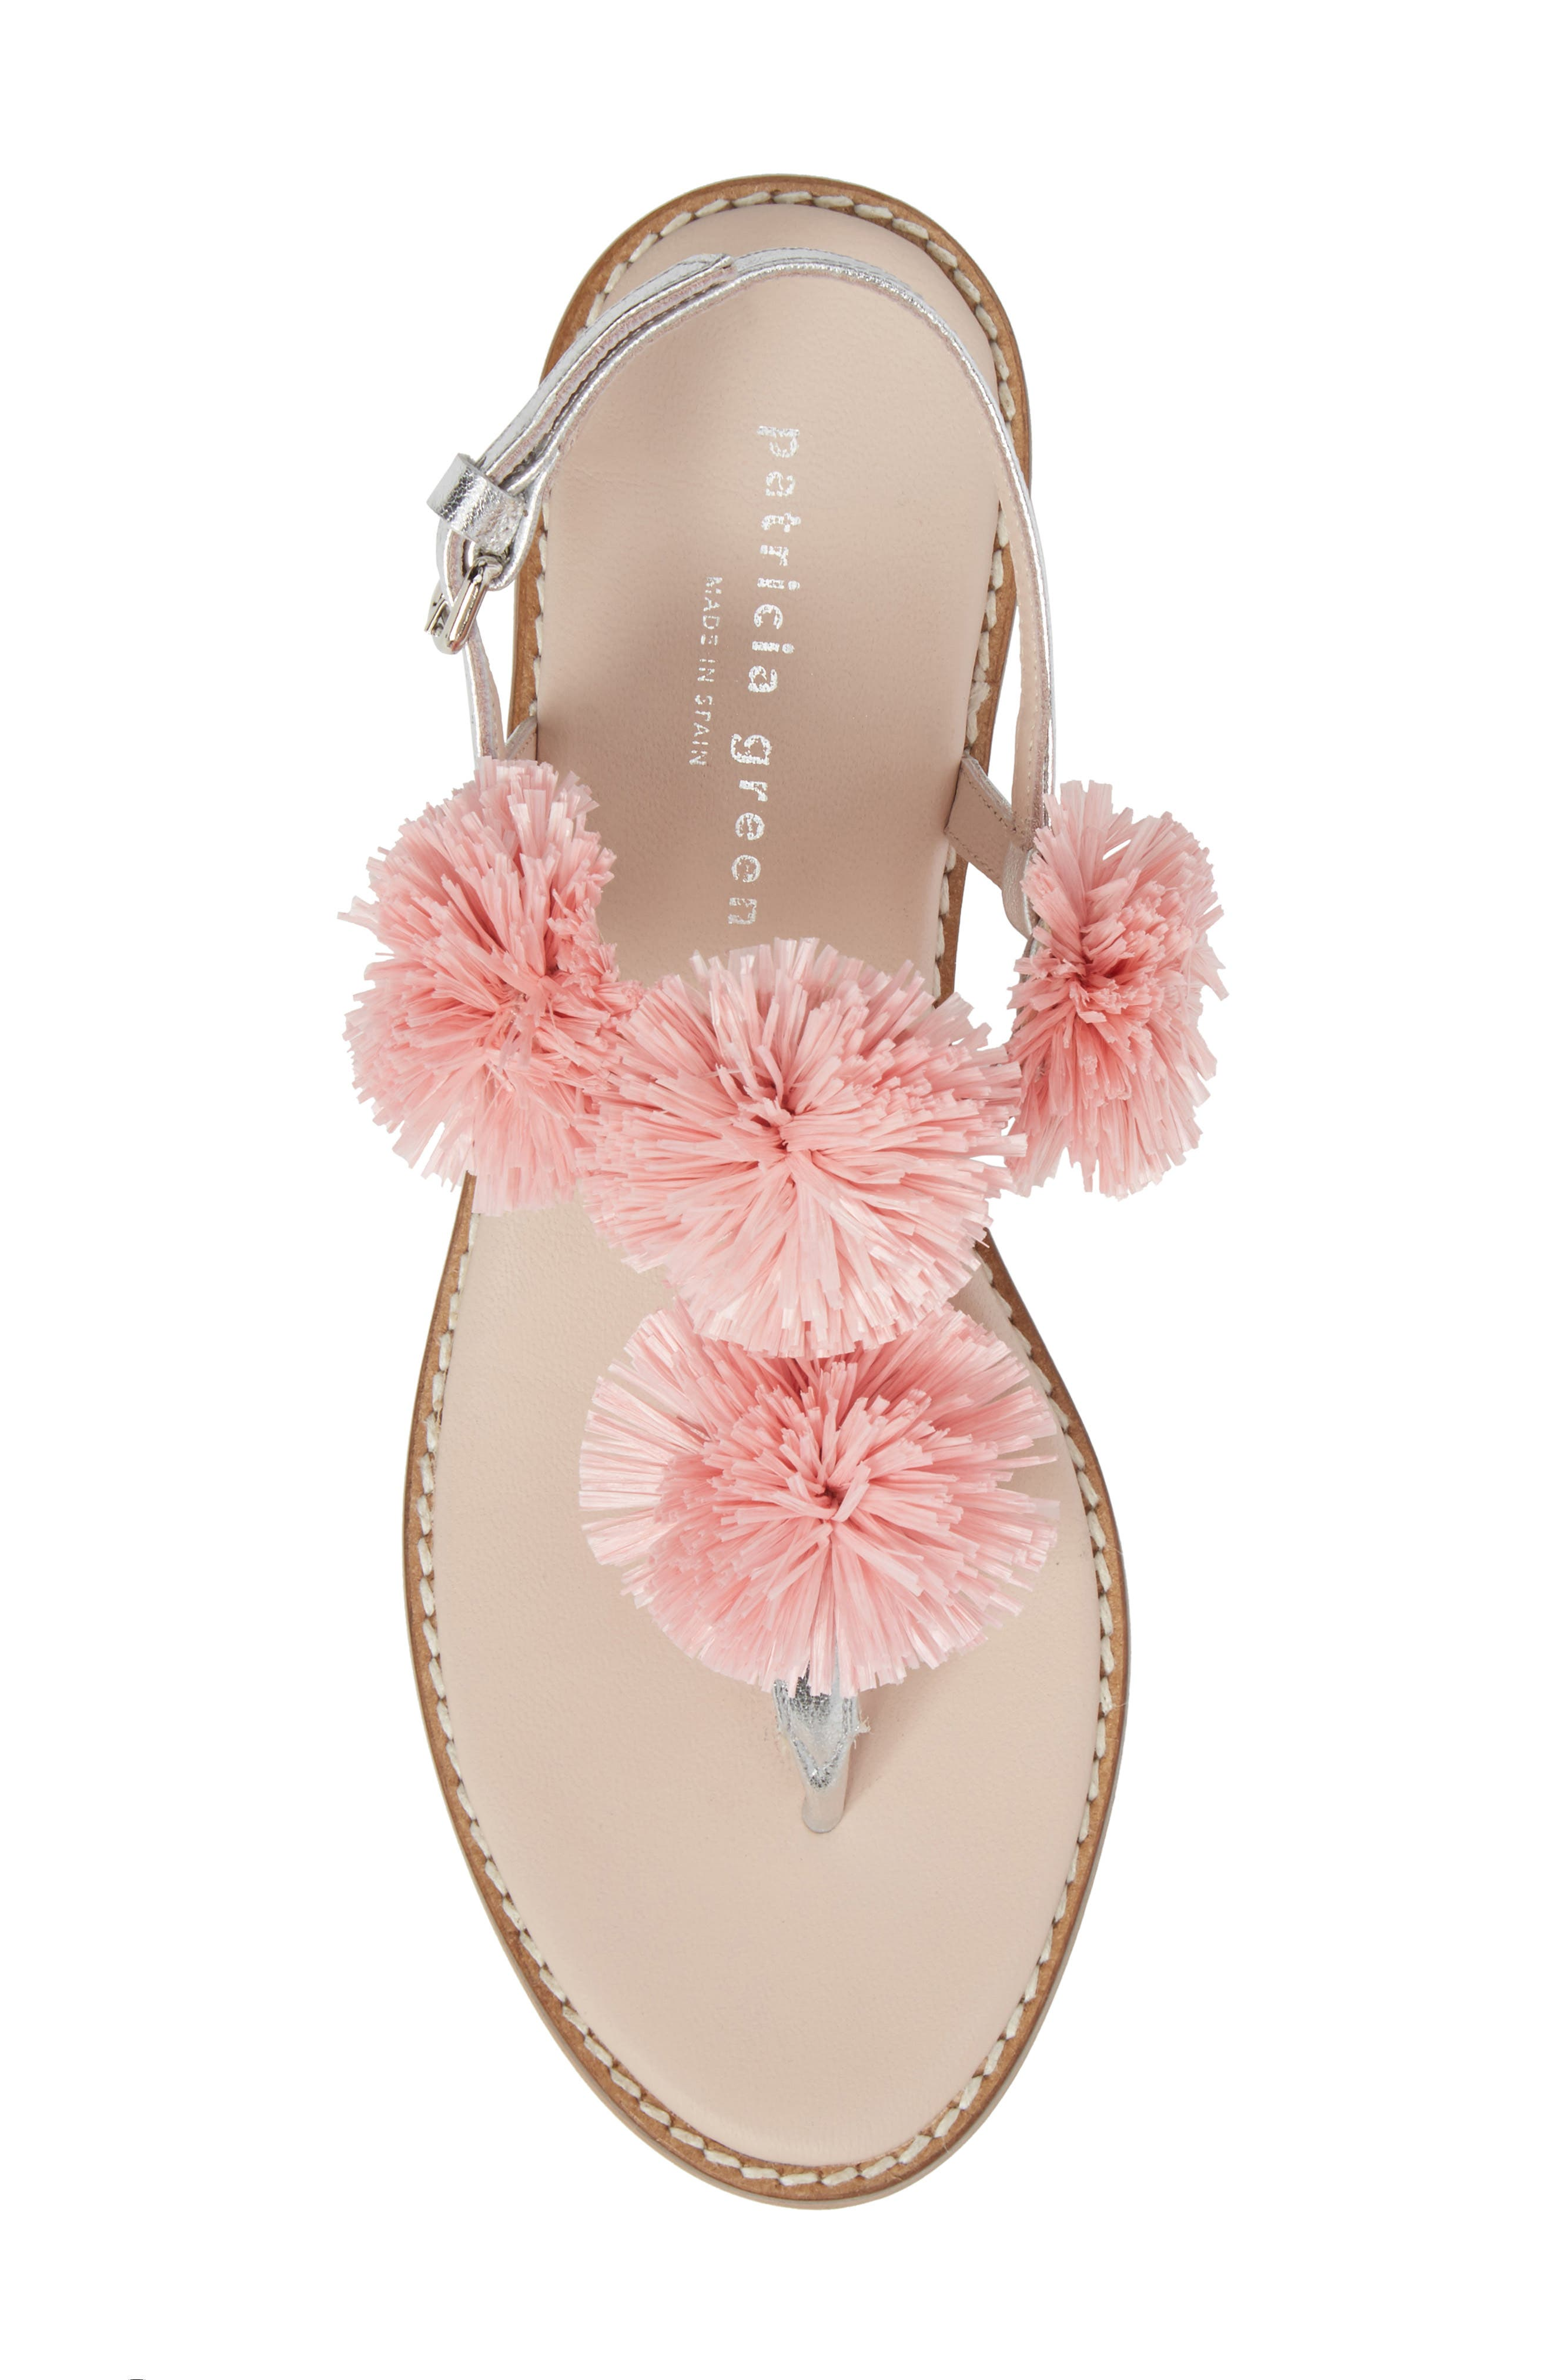 Pompom Thong Sandal,                             Alternate thumbnail 5, color,                             Pink Leather